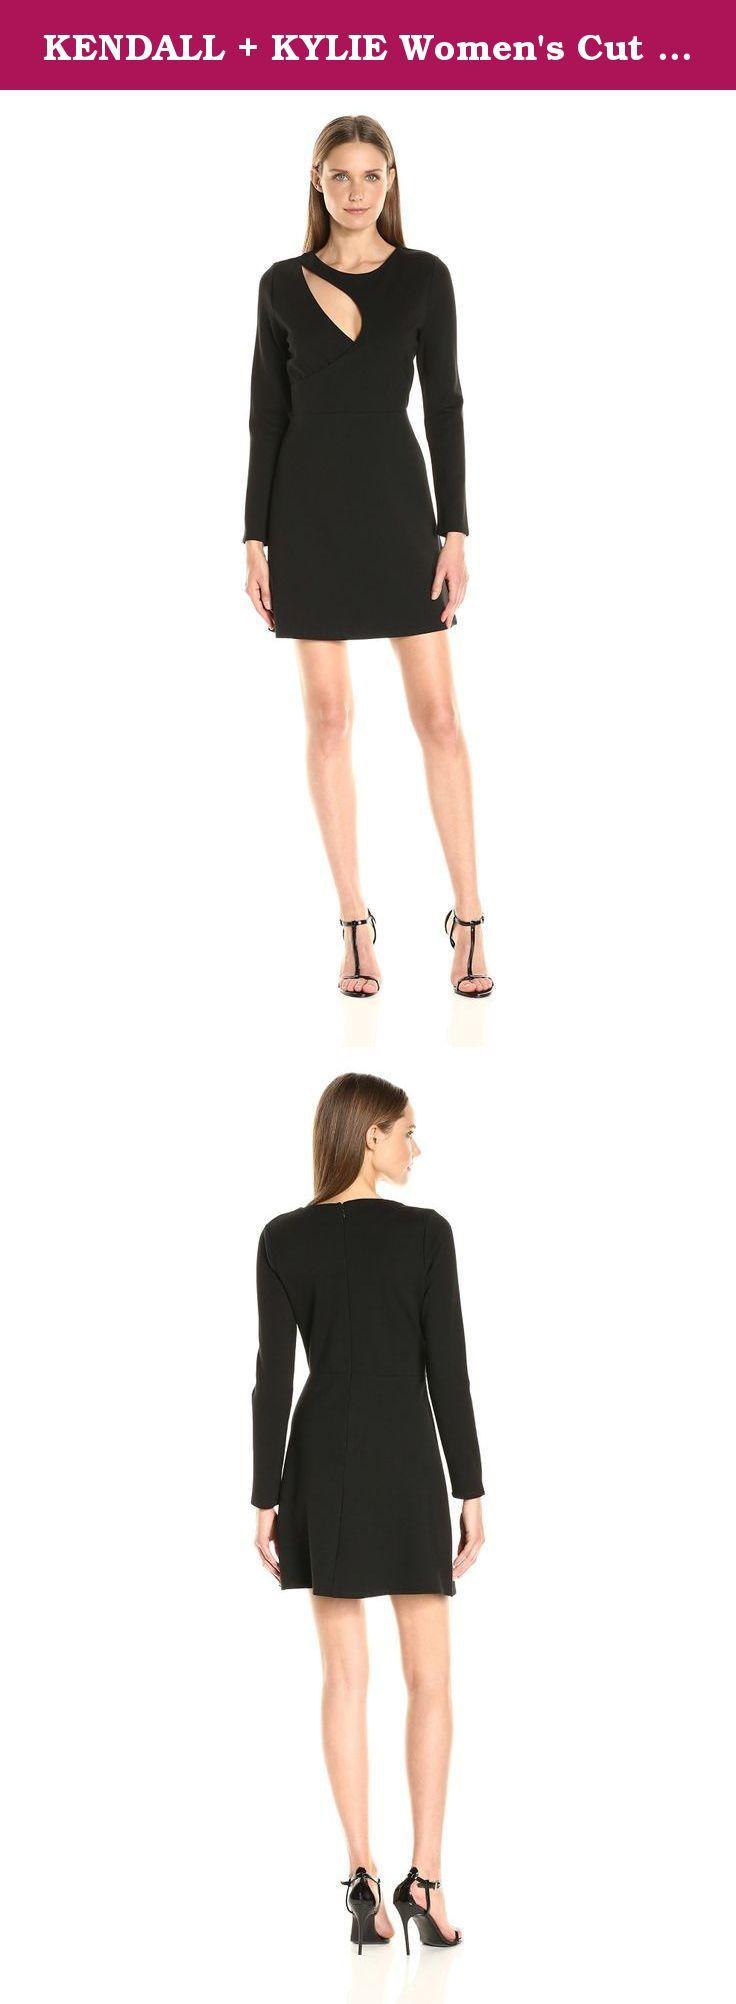 Kendall kylie womenus cut out kit dress black m long sleeve